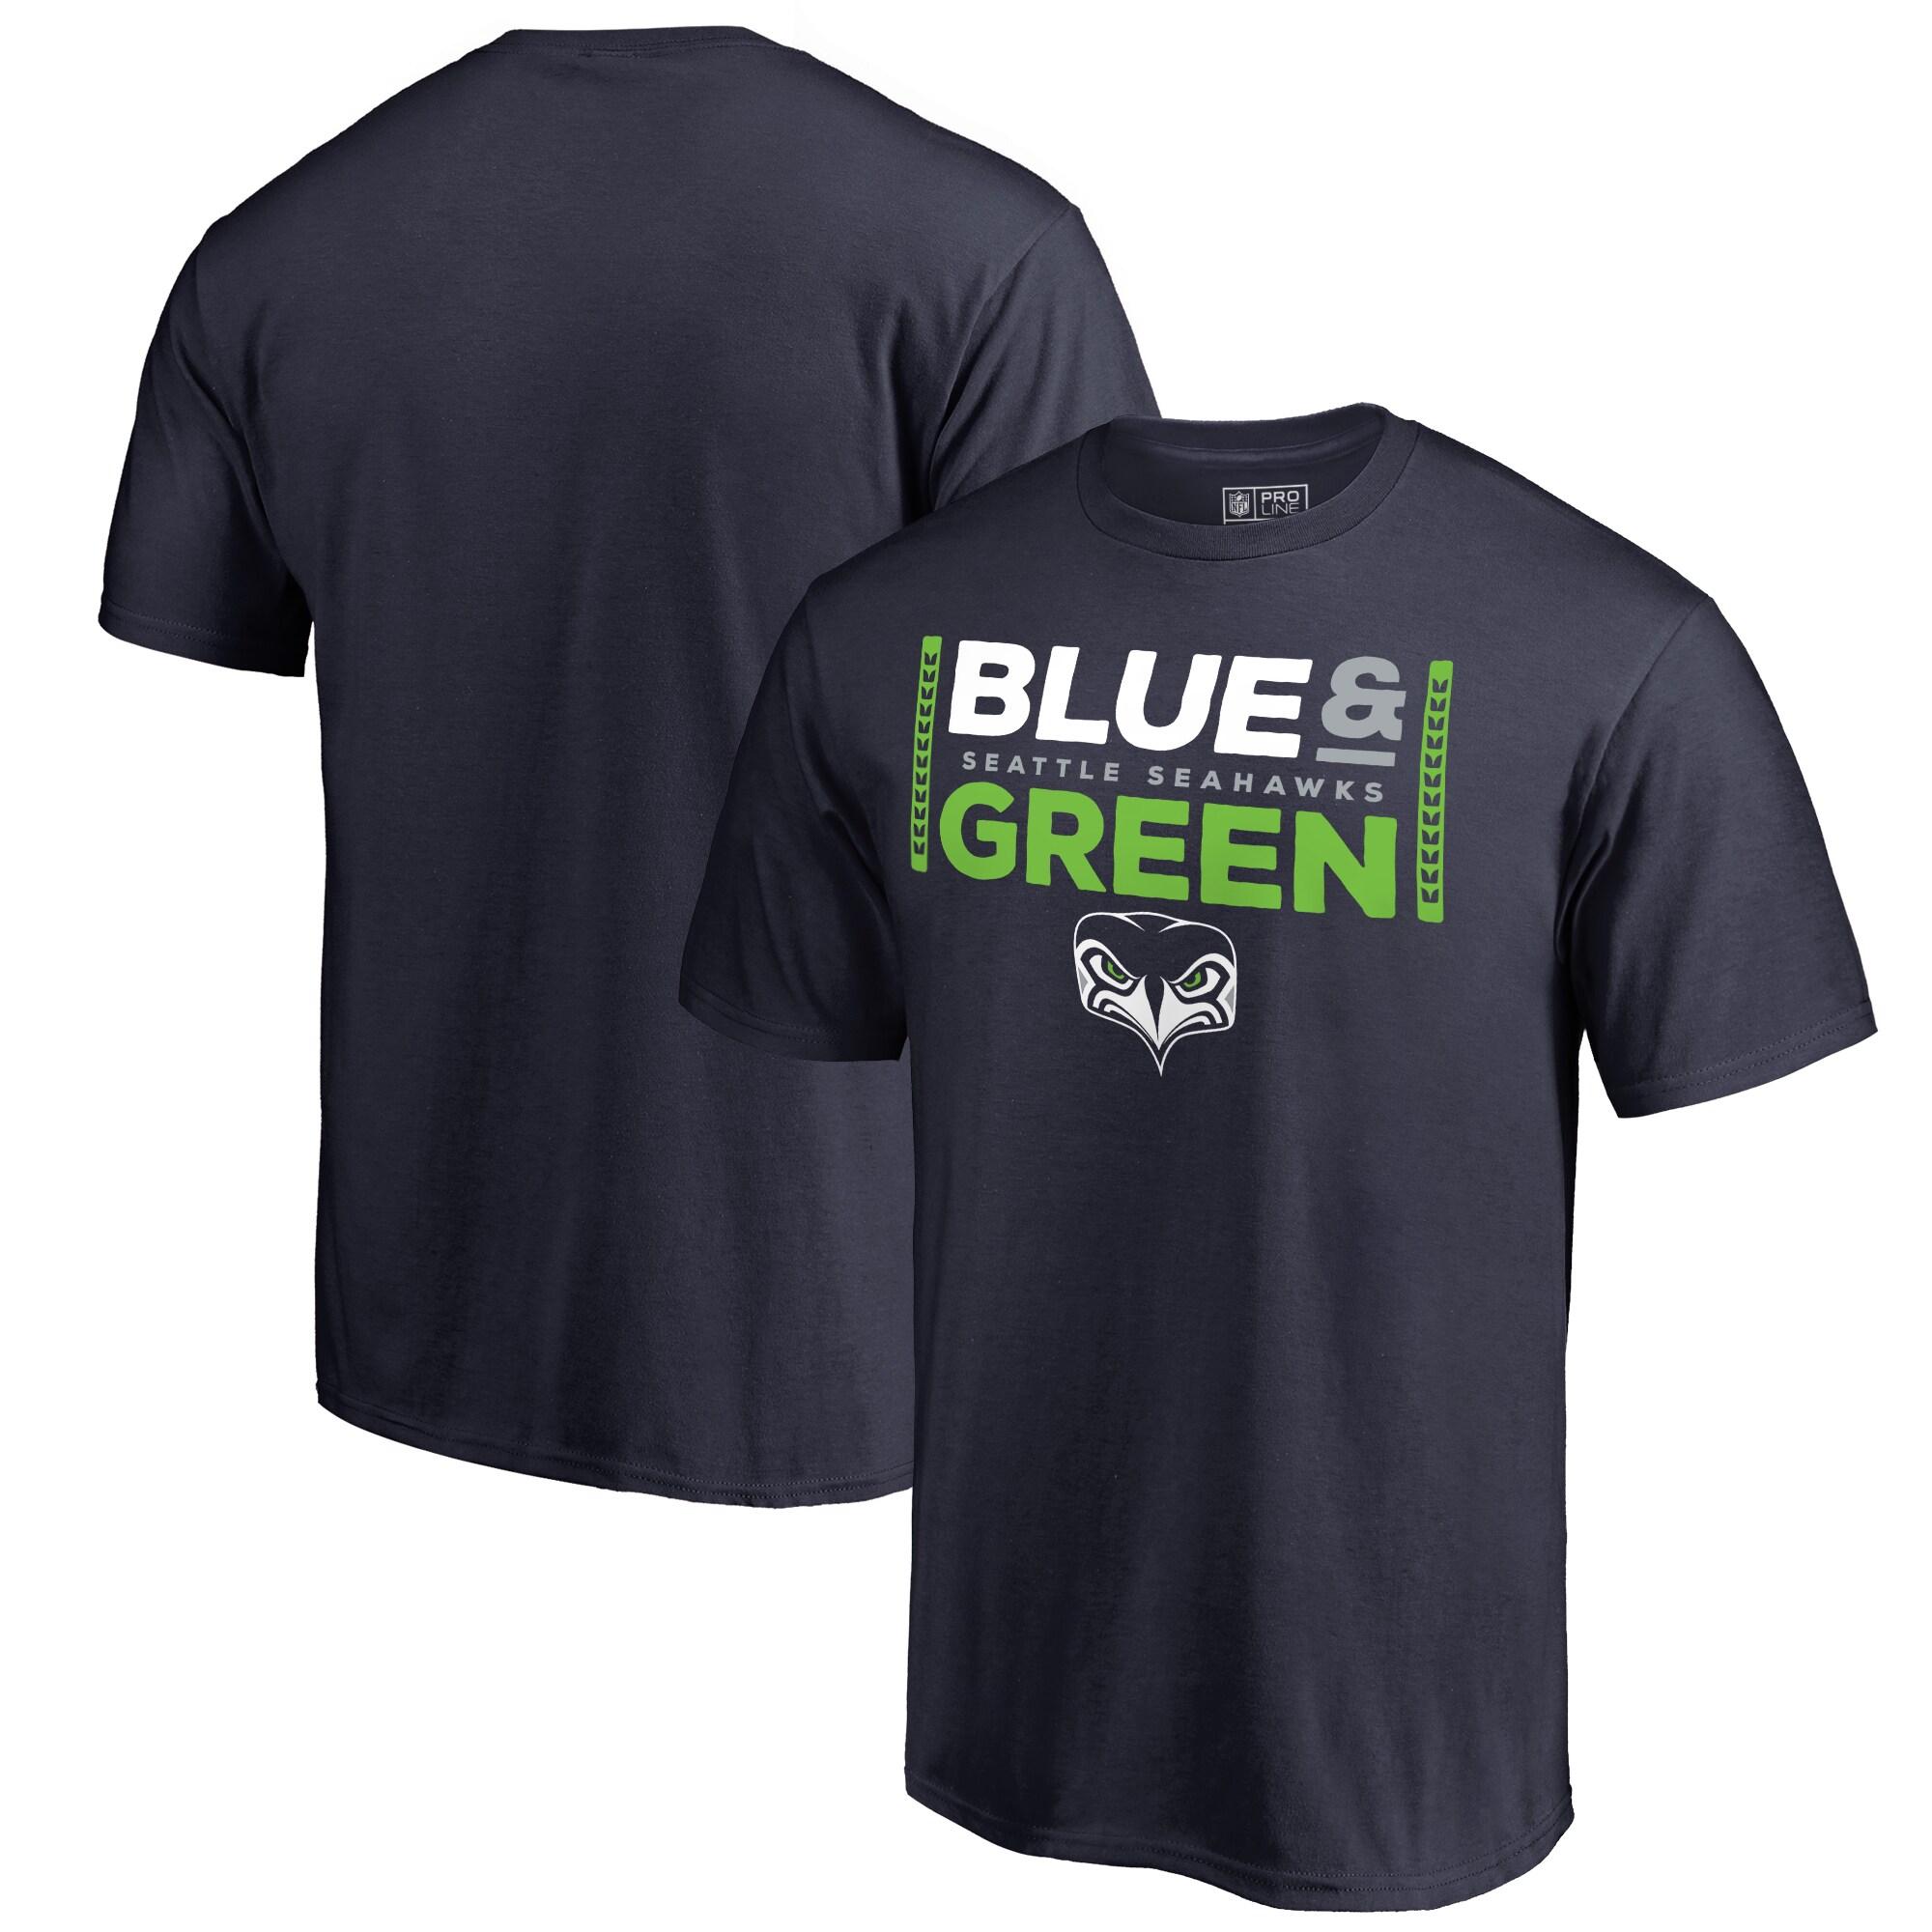 Seattle Seahawks NFL Pro Line by Fanatics Branded Alternate Team Logo Gear Blue & Green T-Shirt - College Navy